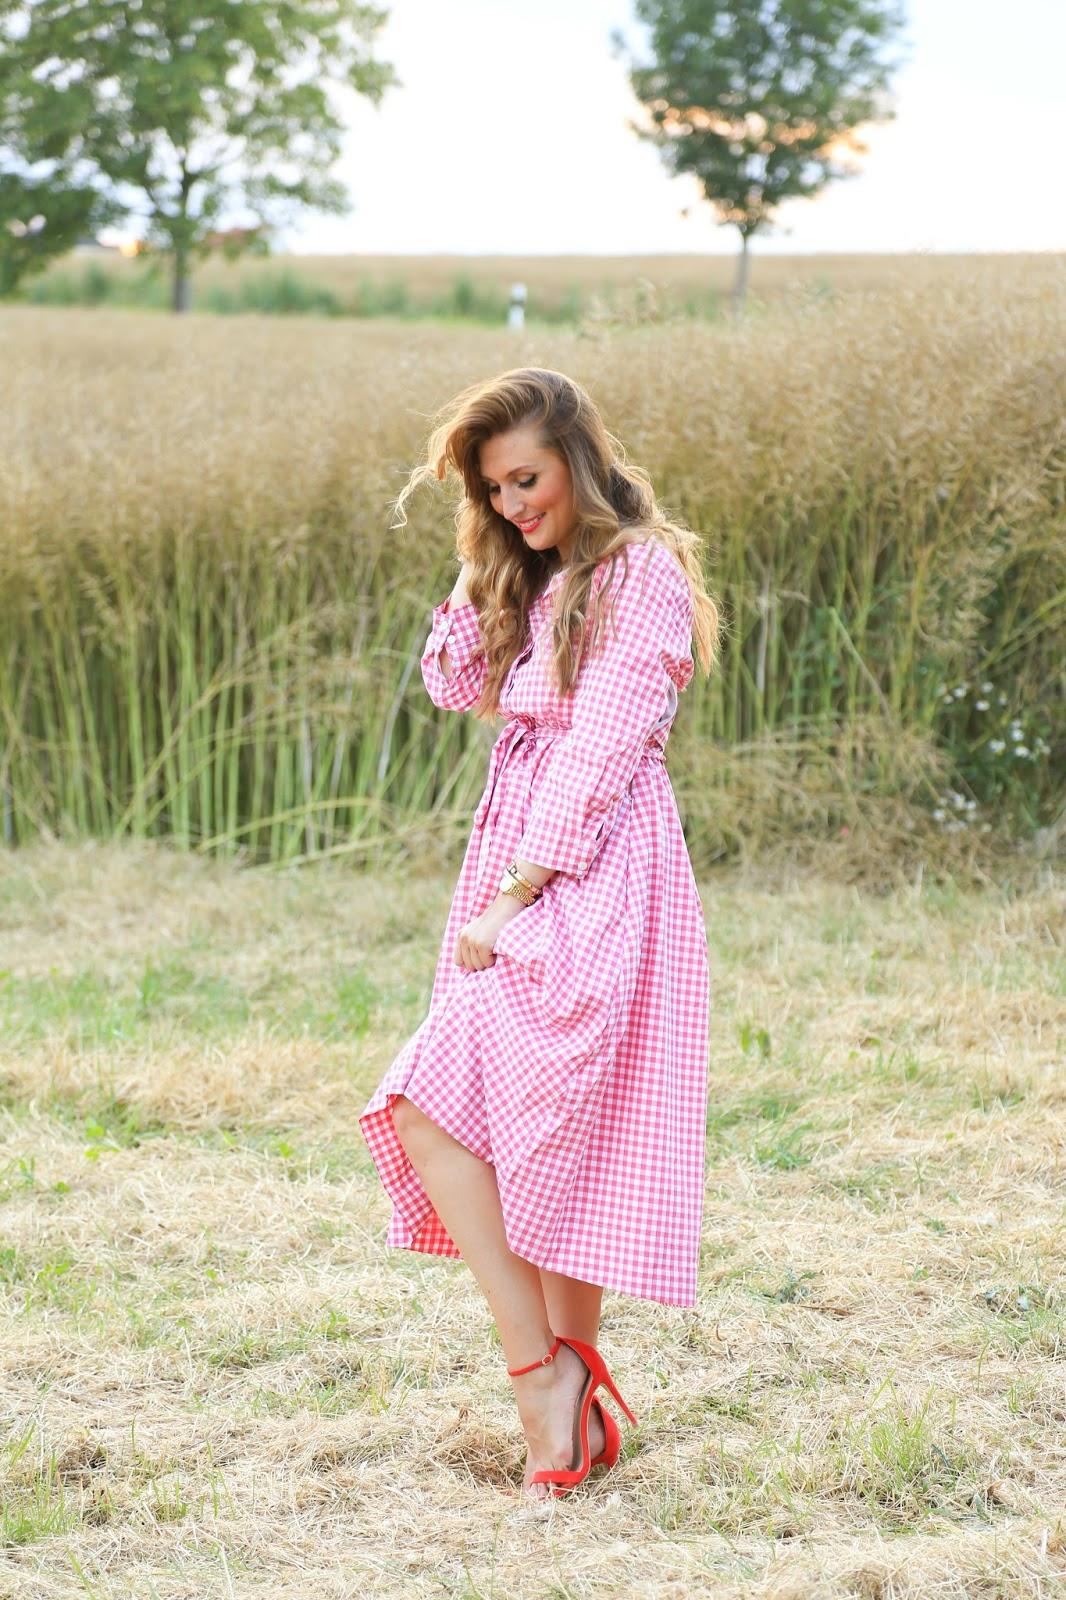 Fashionstylebyjohanna Blogger aus Frankfurt - Frankfurt Fashionblogger - Fashionstylebyjohanna - Dainty Jewells - Daintyjewells Dress